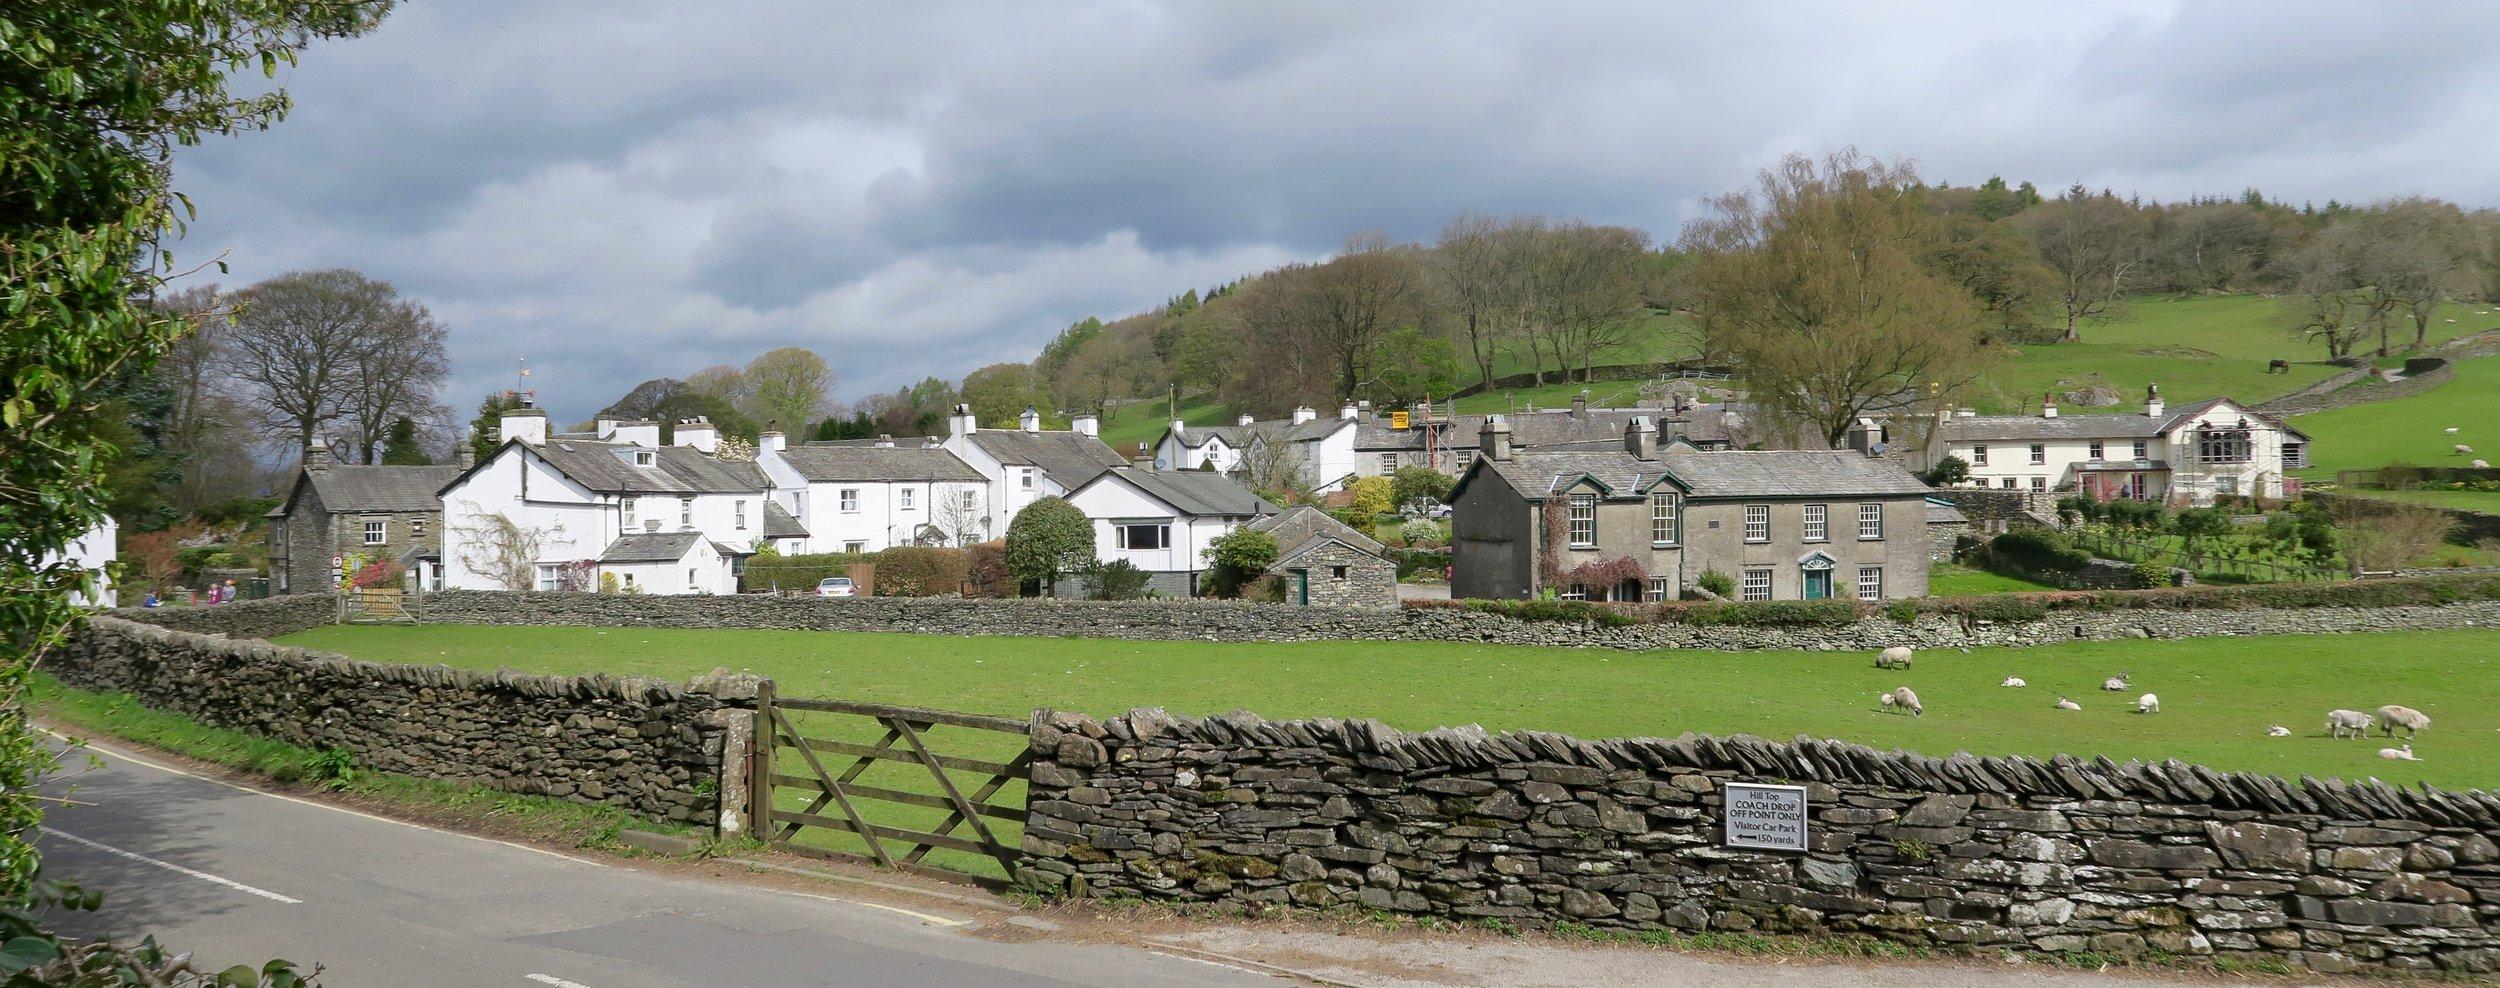 Beatrix Potter's village (Sawrey, England)